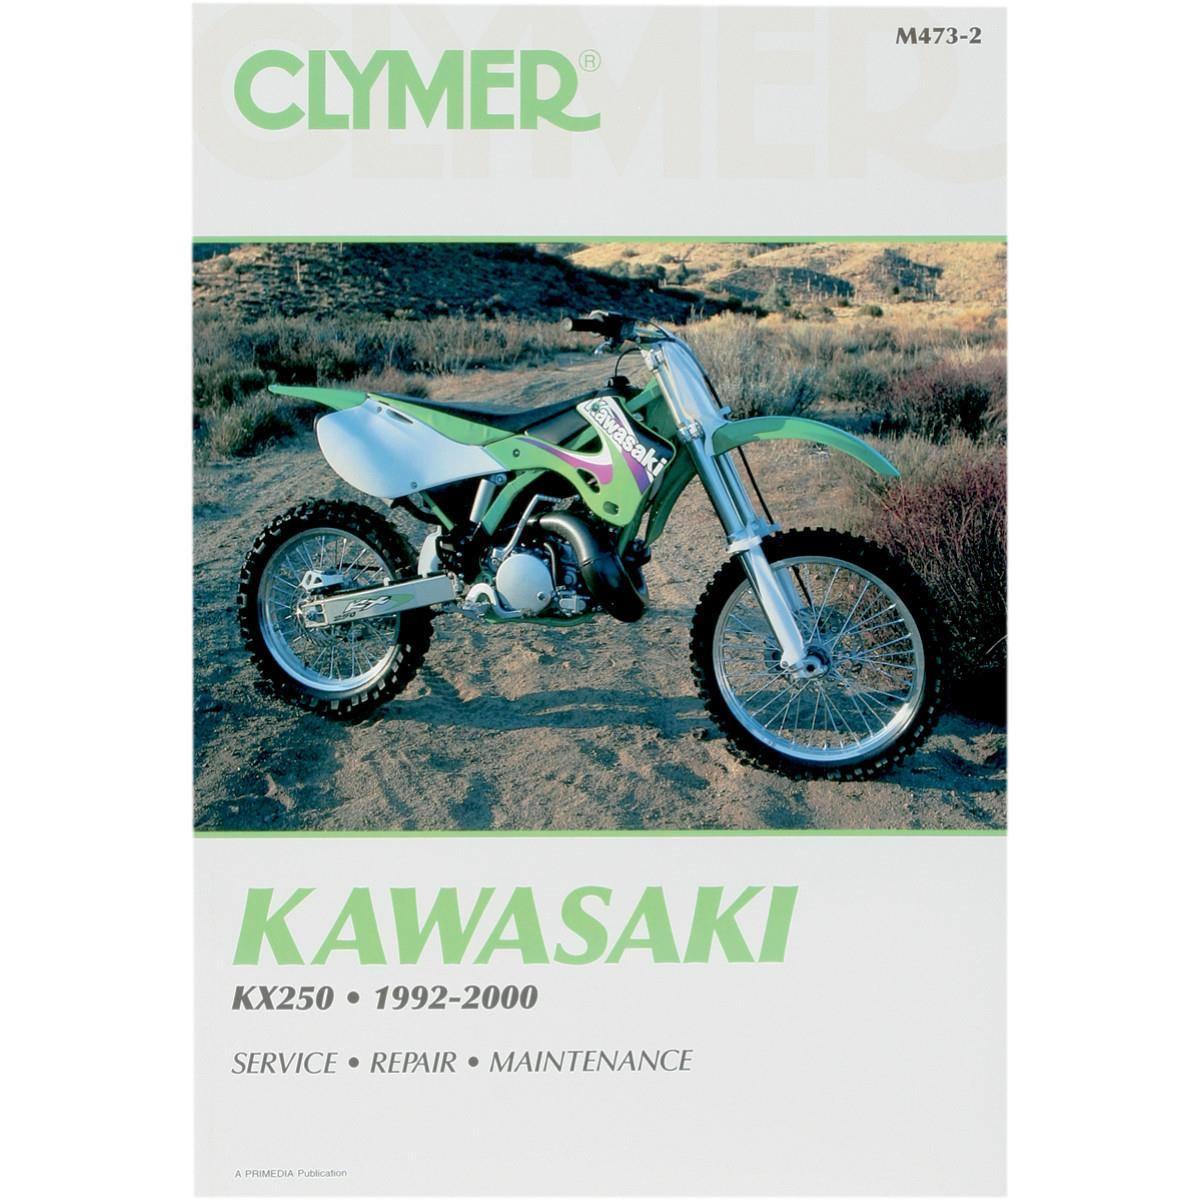 Repair Manual for sale in Crete, IL | Wizards of Wheels Yamaha Kawasaki  (708) 672-5603